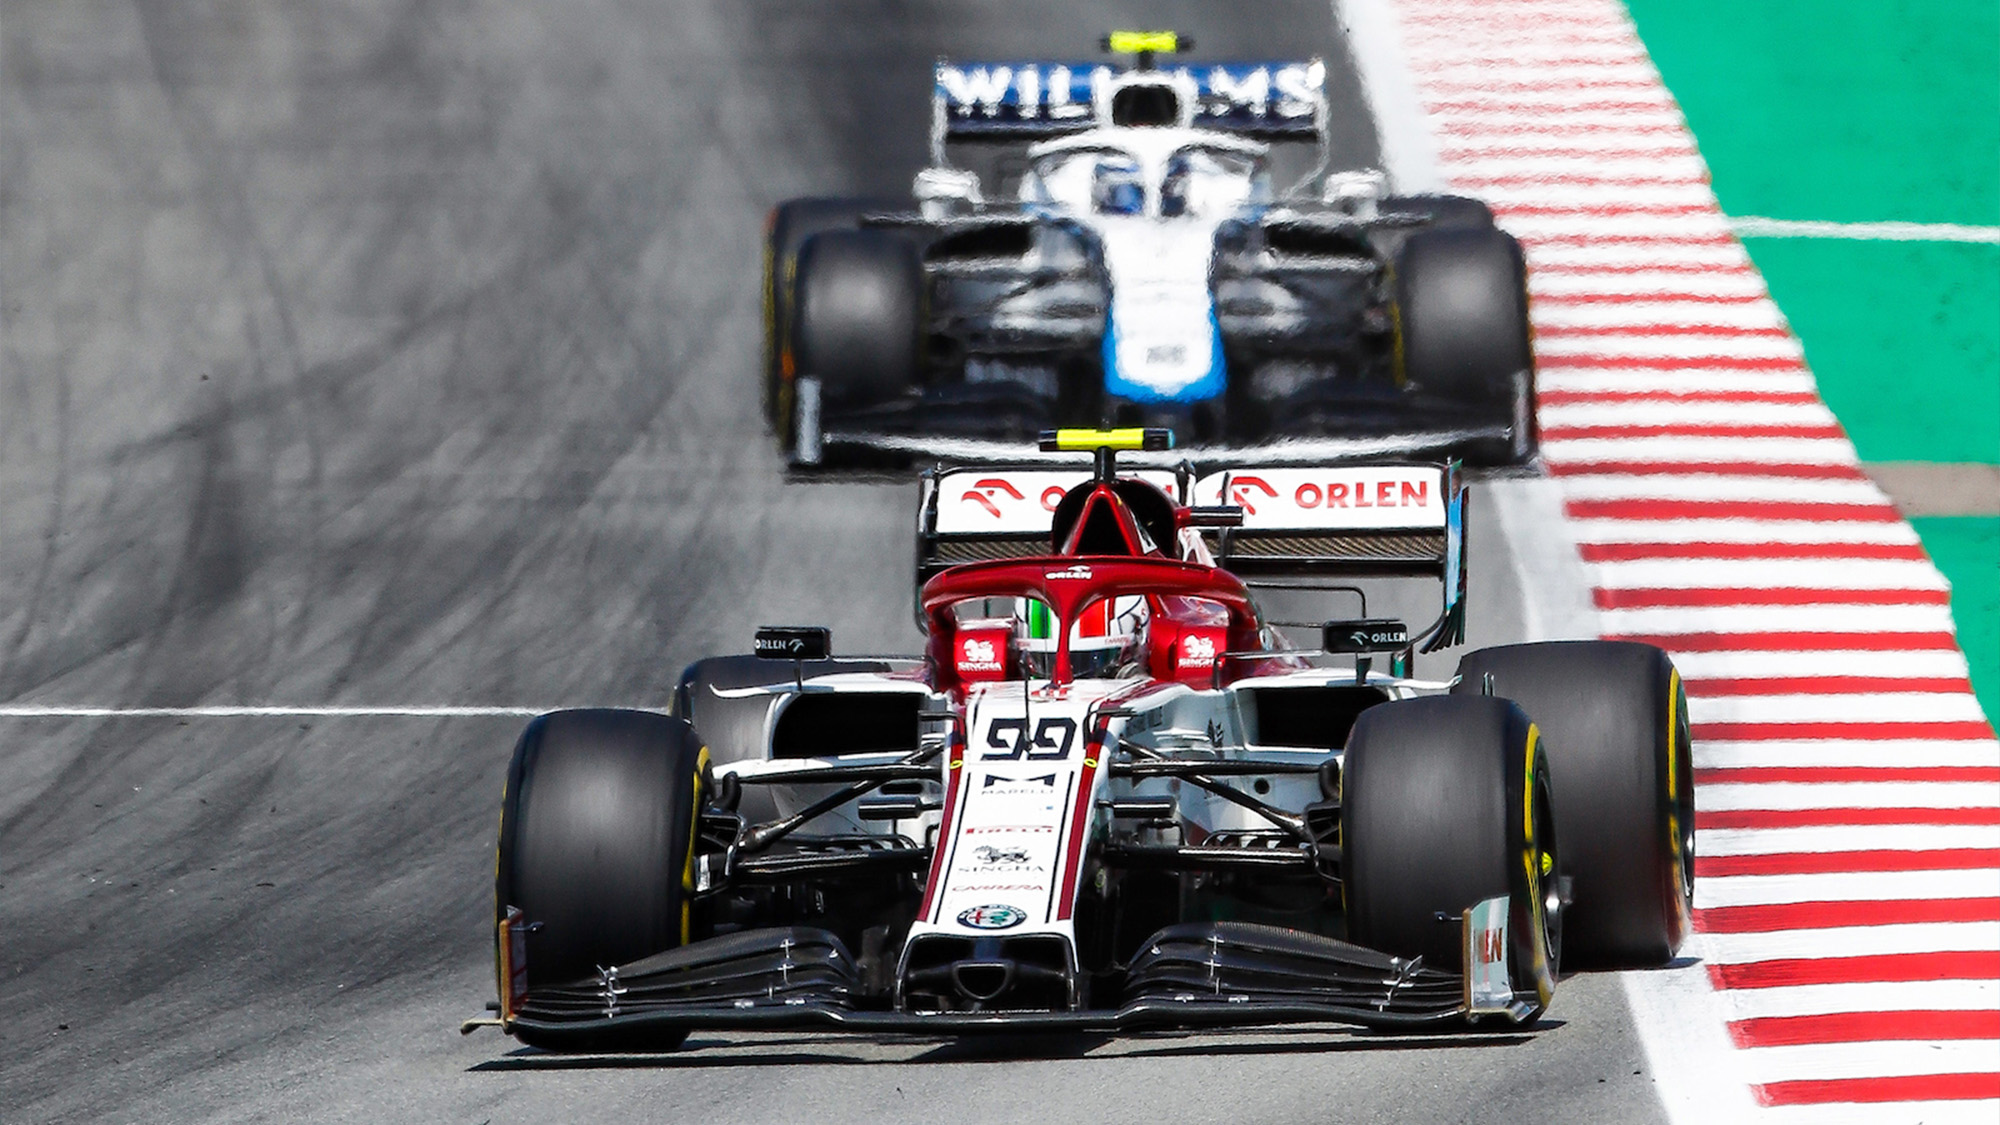 Antonio Giovinazzi and Nicholas Latifi on track in the 2020 Spanish GP